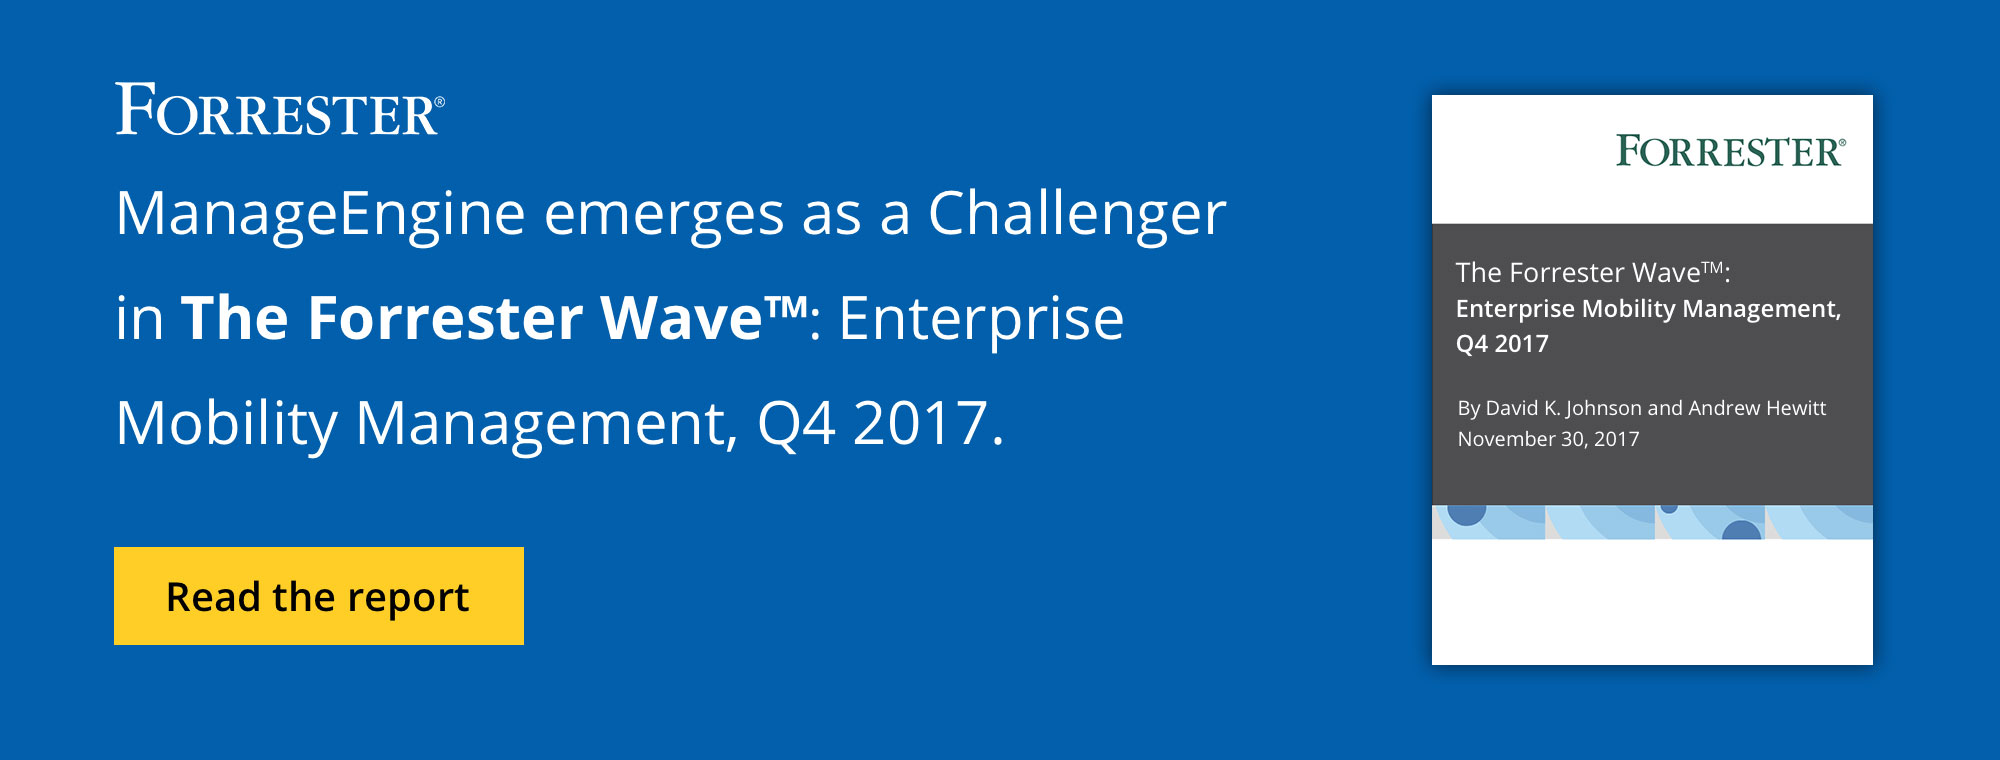 ManageEngine emerges as aChallenger    inThe Forrester Wave™:Enterprise Mobility Management, Q4 2017.